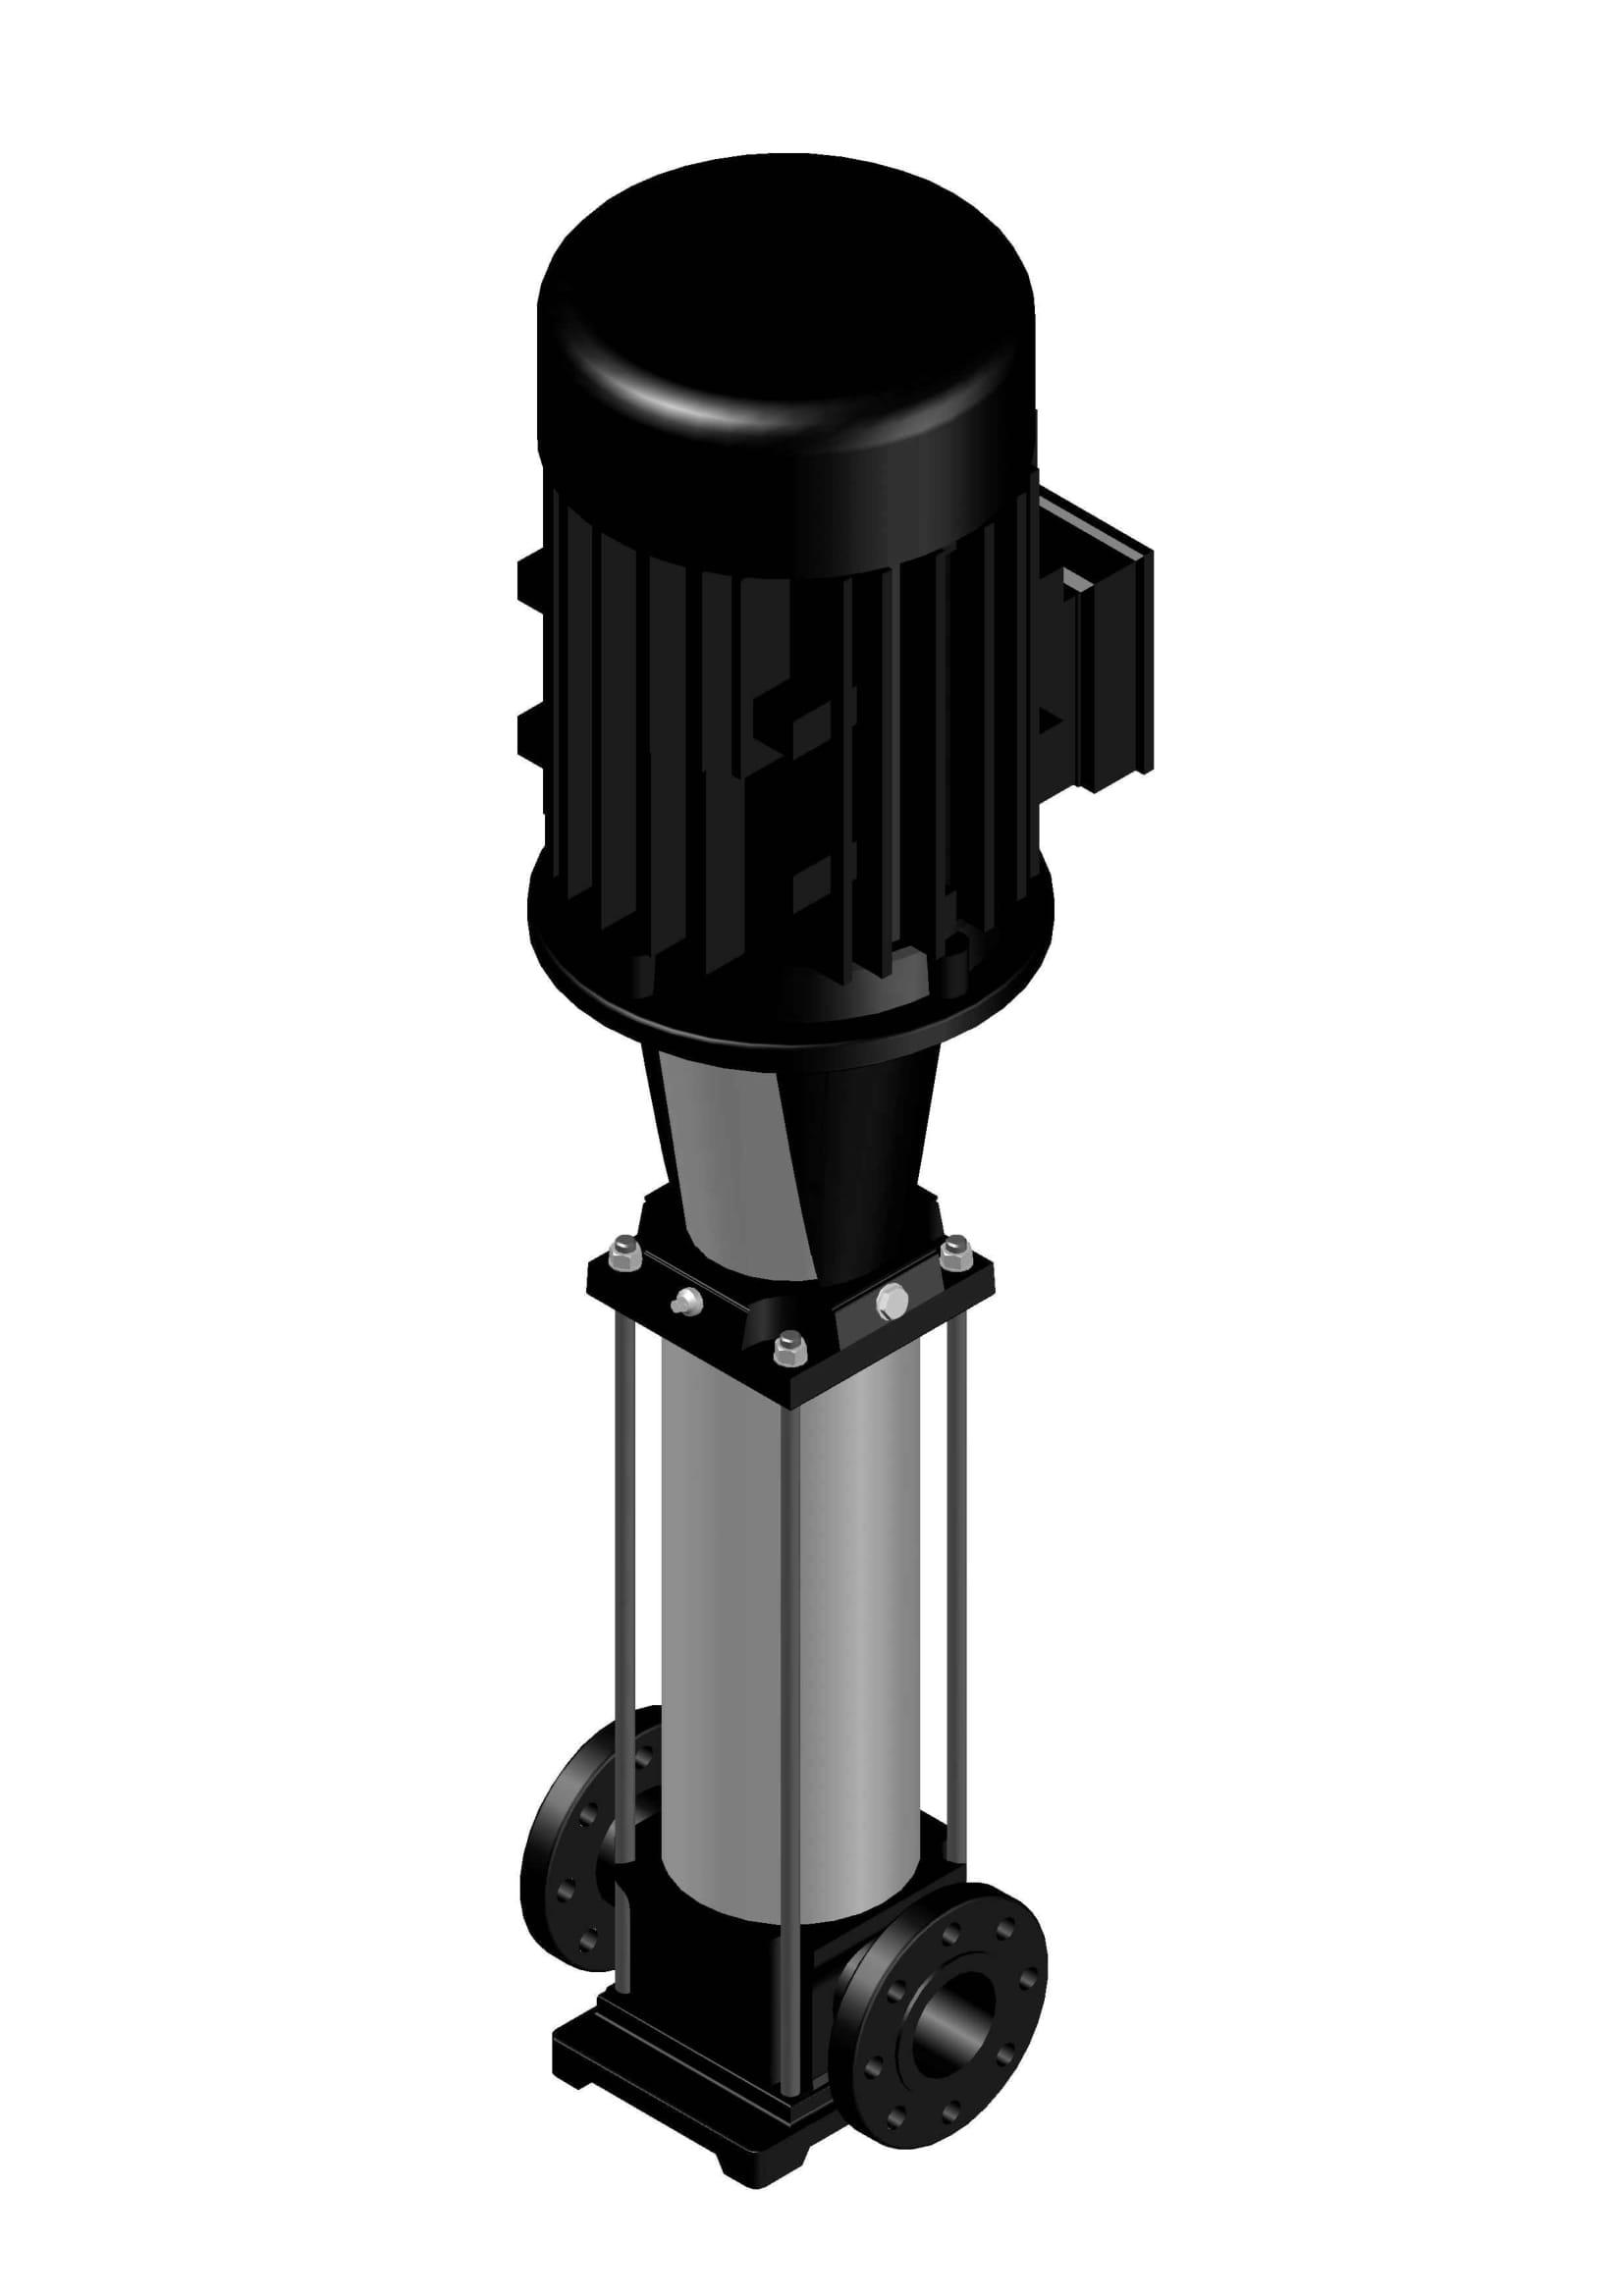 BV 64-07-01